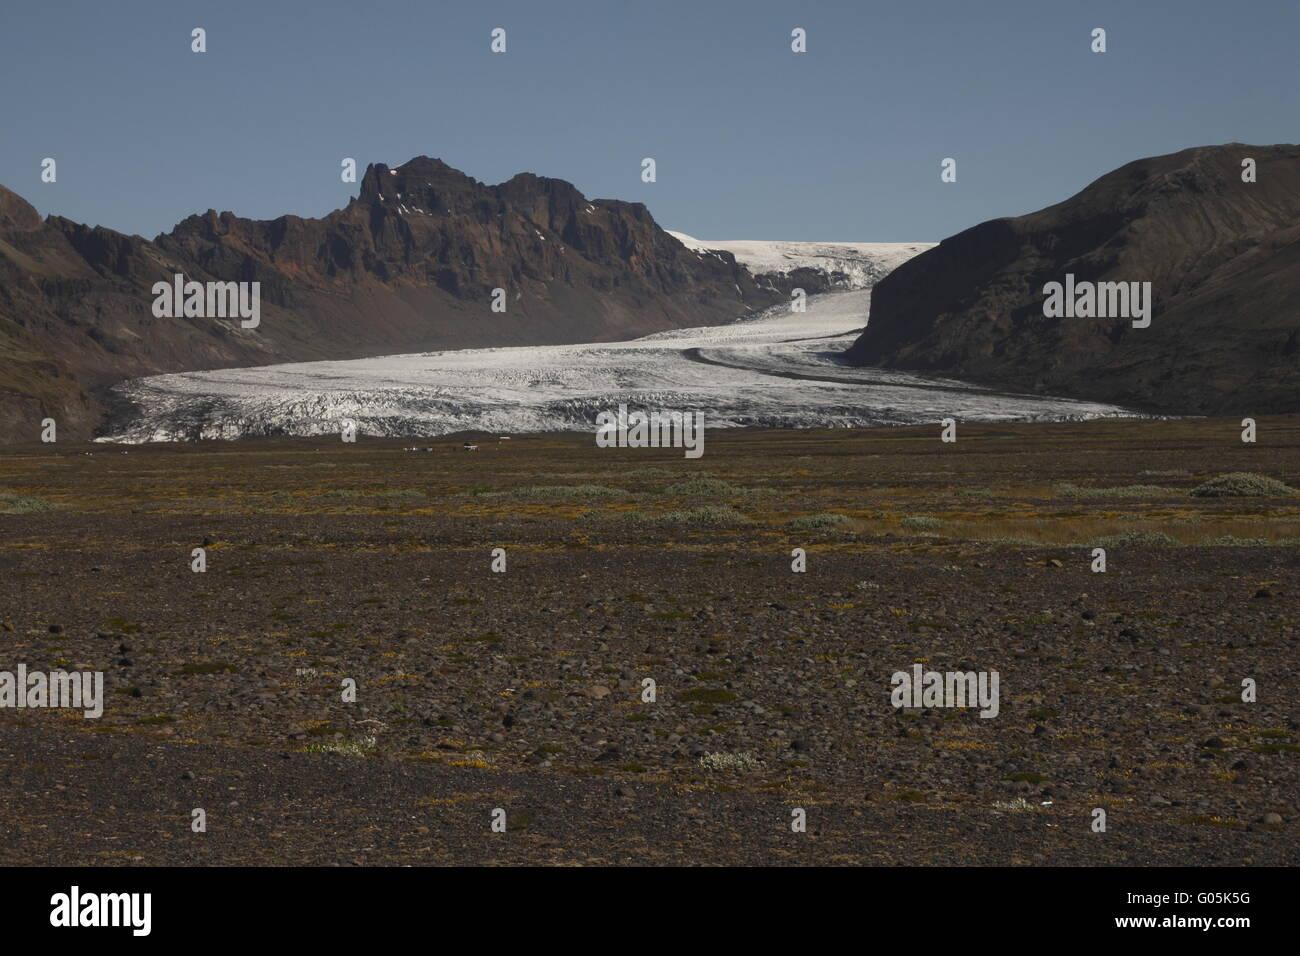 Skaftafellsjökull is one of the outlet glaciers (glacier tongues) of the Vatnajökull ice cap. Skaftafell - Stock Image